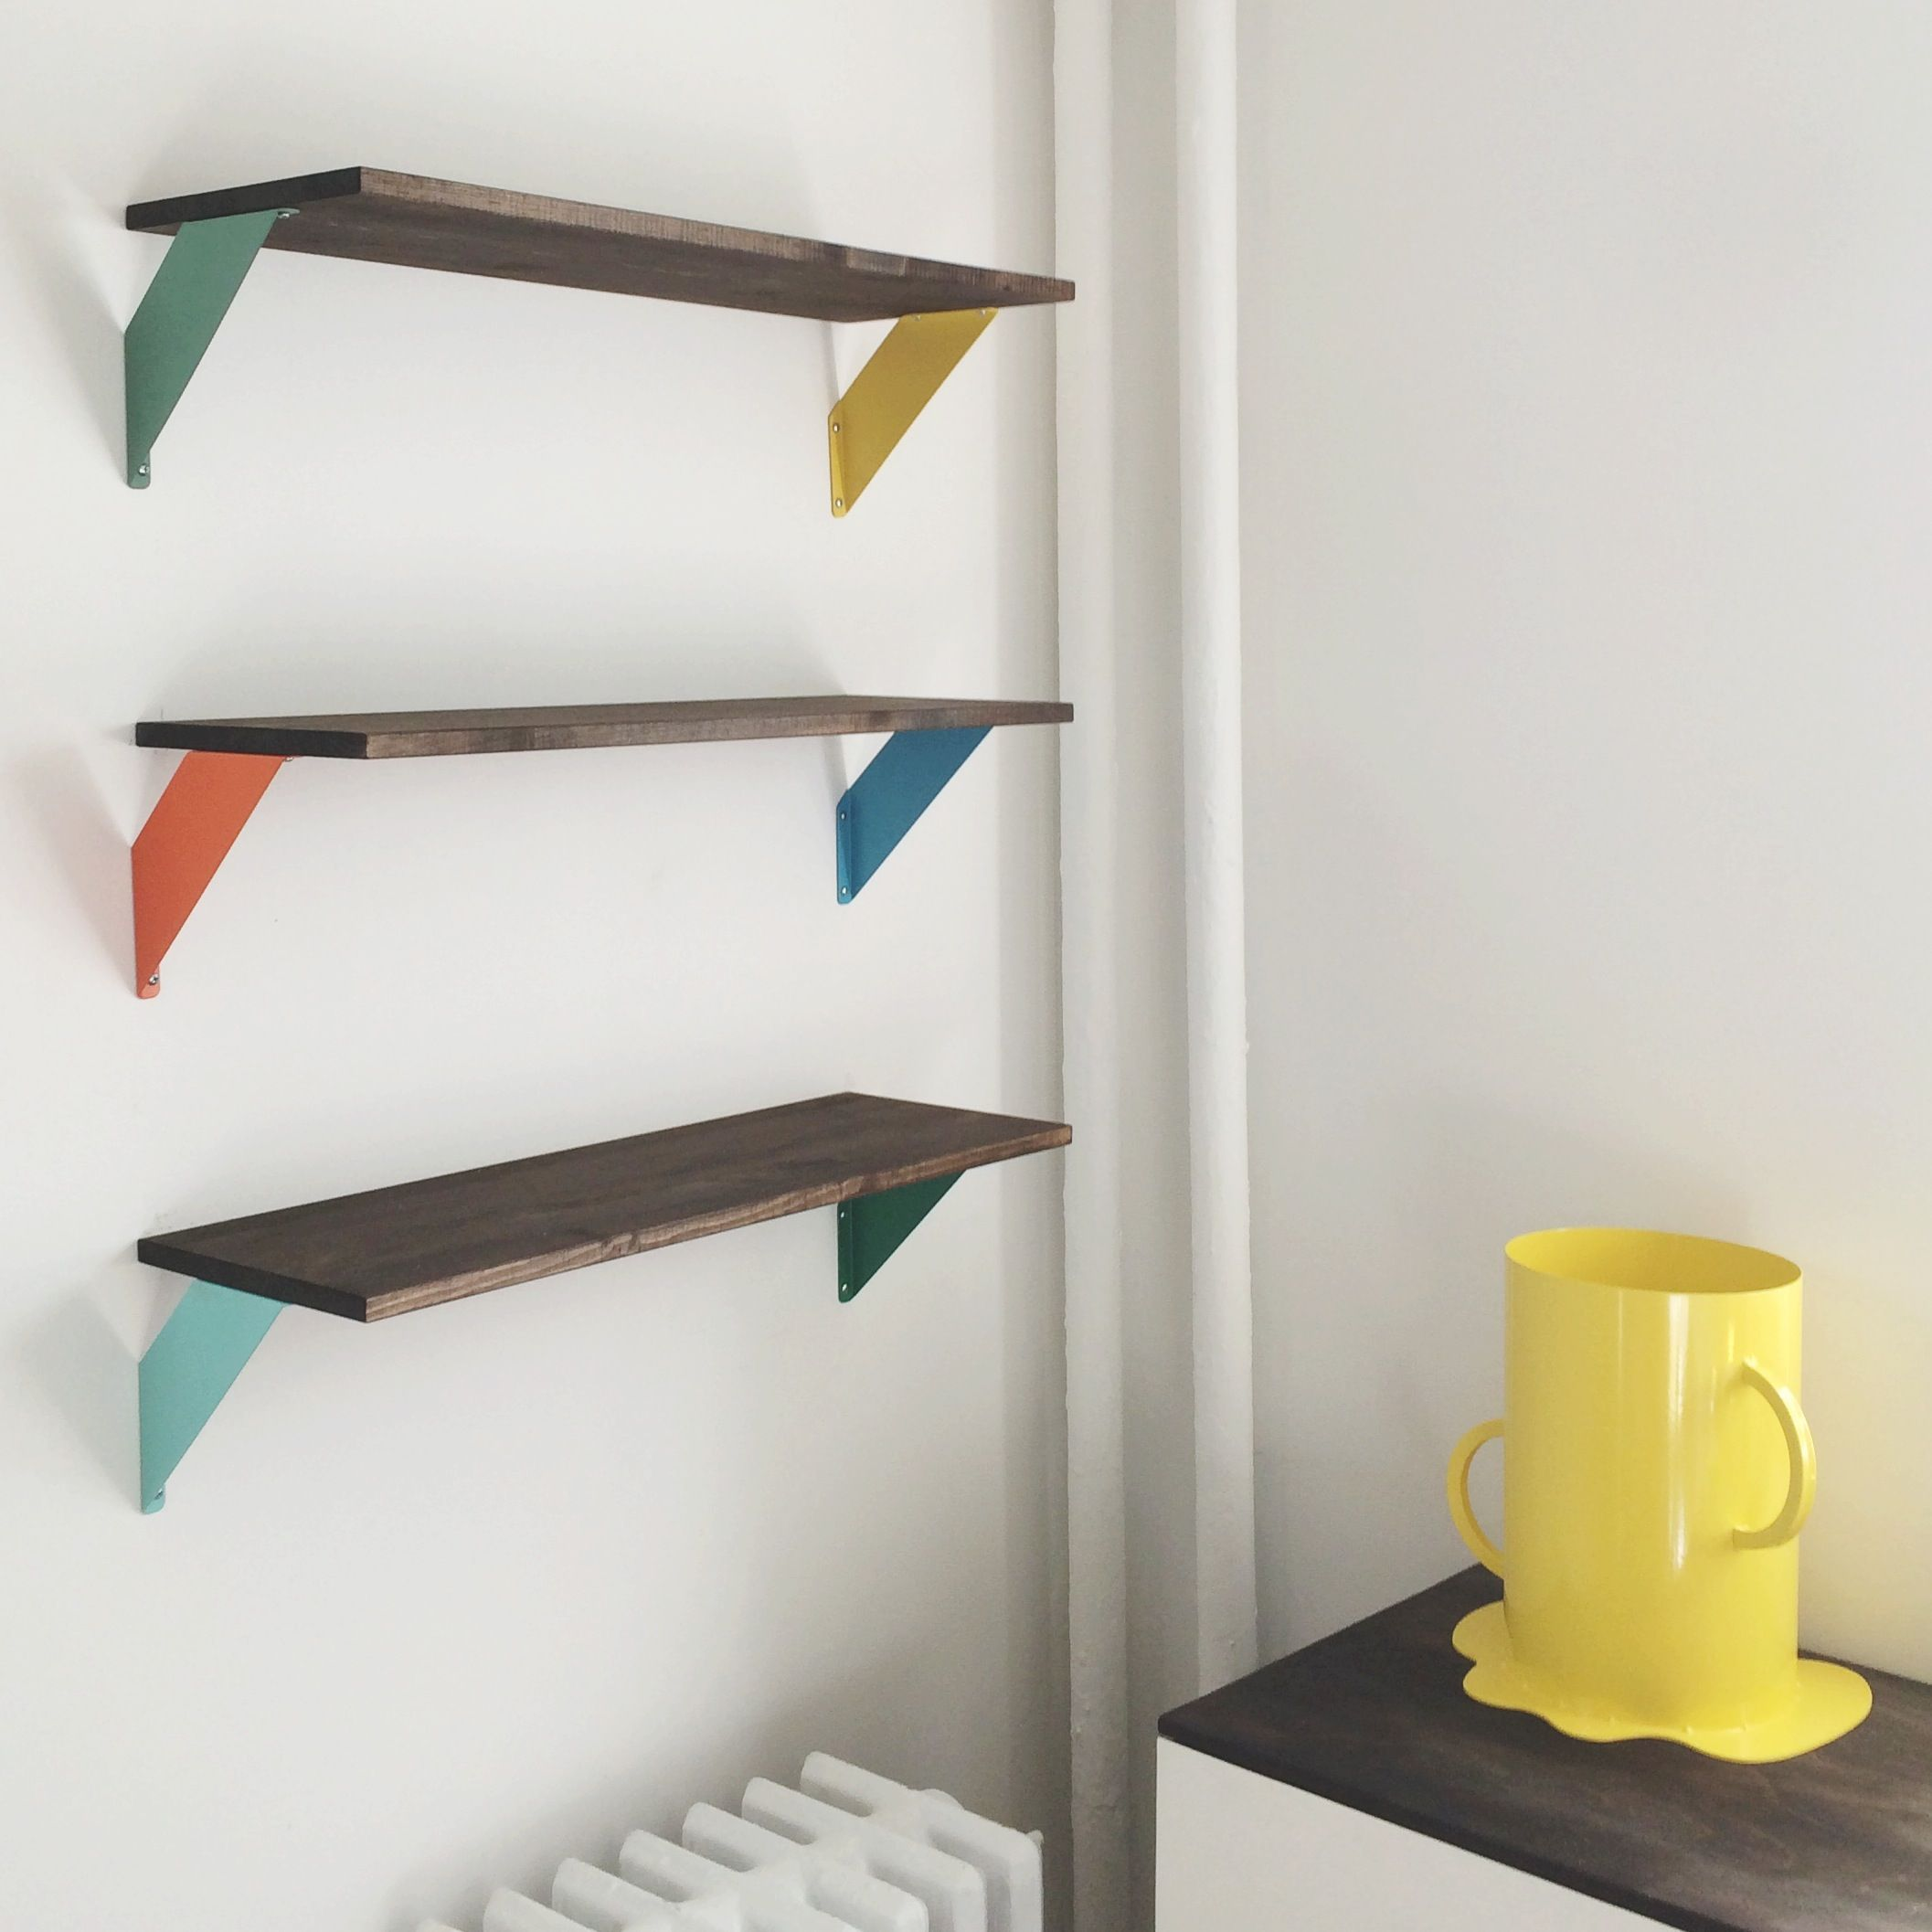 IKEA shelves spray paint stain △ Home Sick △